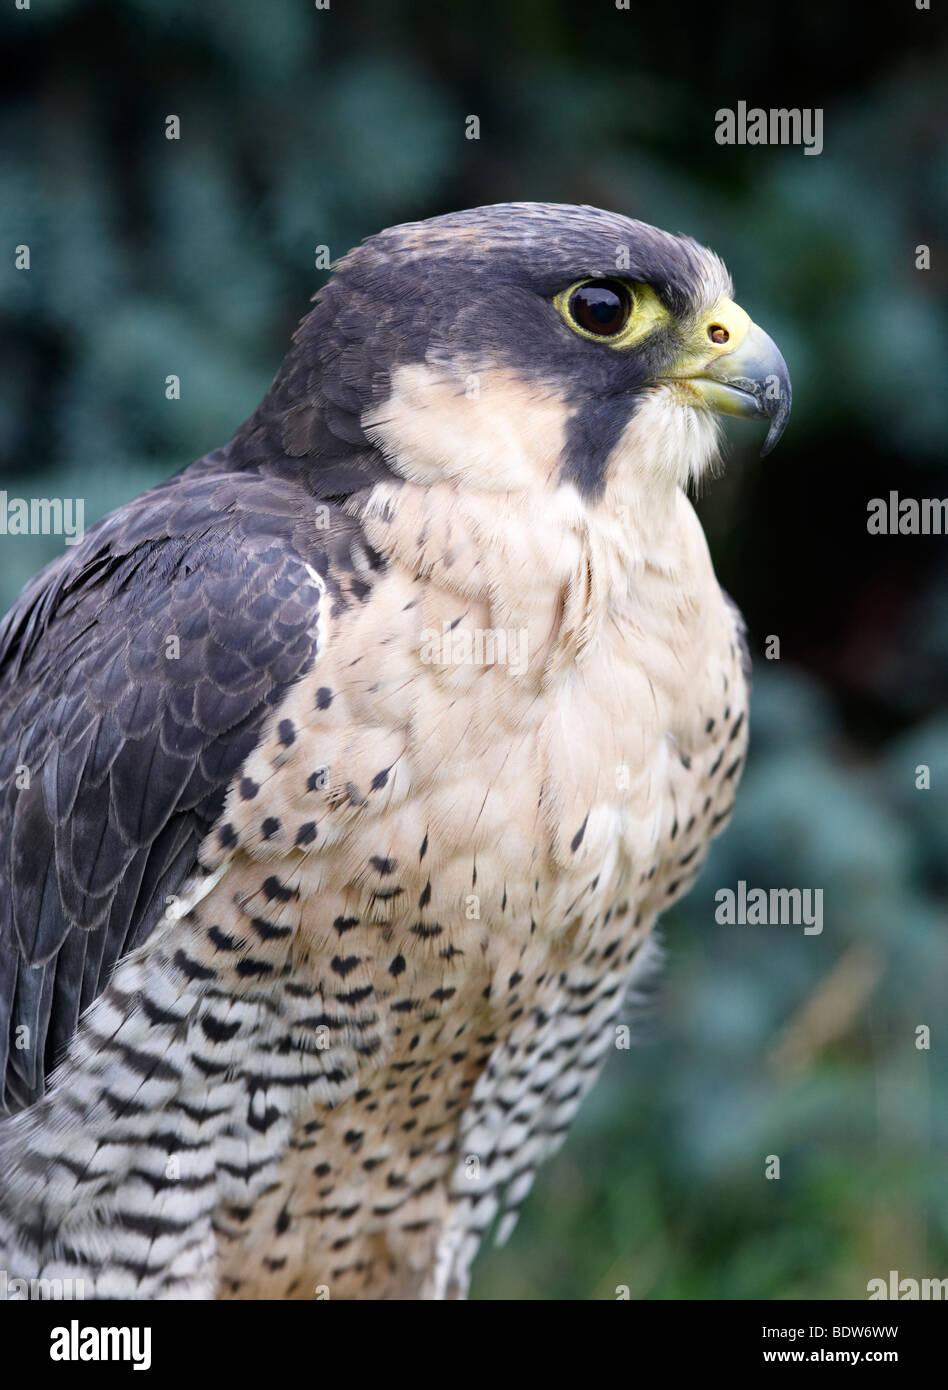 PEREGRINE X LANNER FALCON, FALCO PERIGRINUS X BIARMICUS, BIRD, BIRD OF PREY, FALCONRY - Stock Image